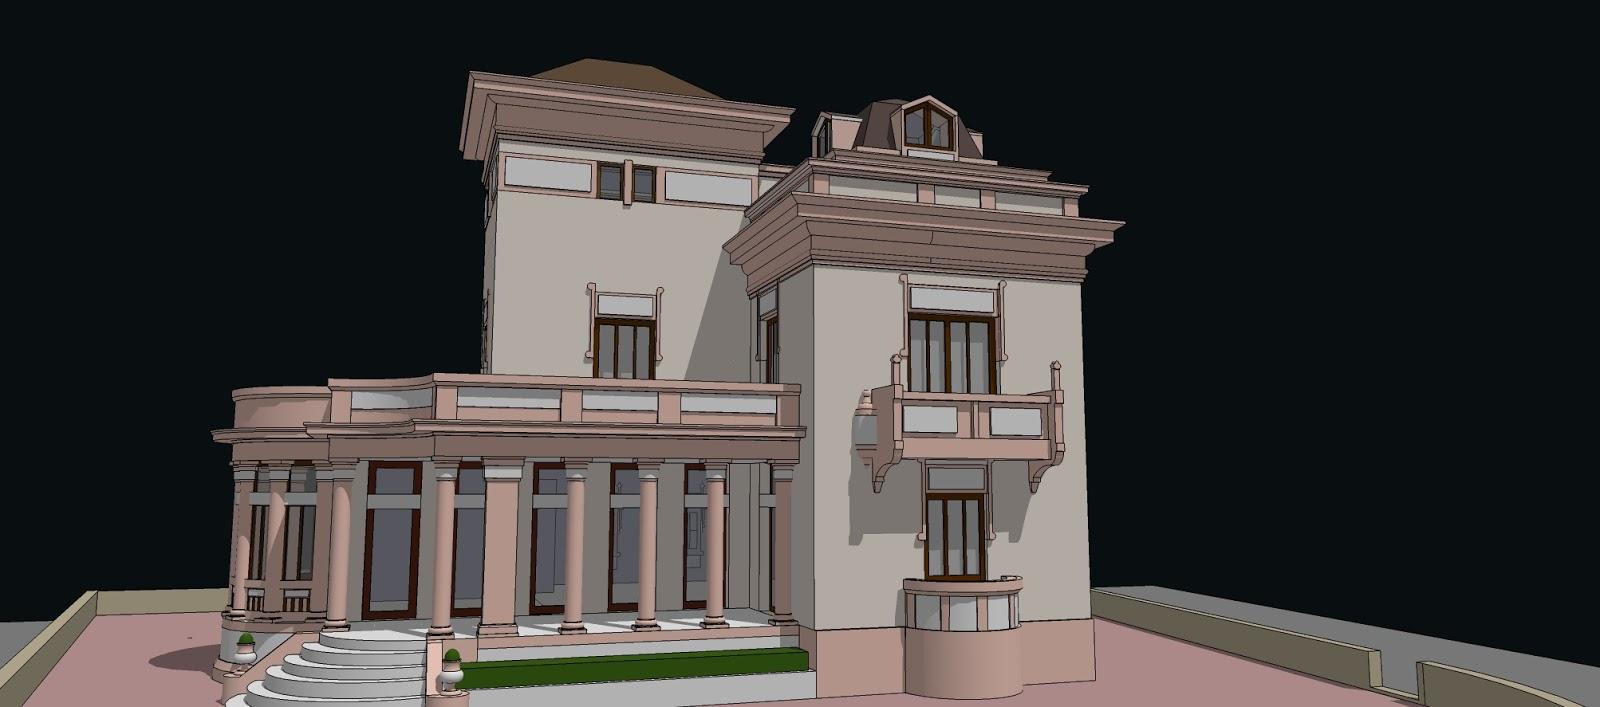 Arquitectura hist rica en tenerife espa a chalet plaza - Arquitectos en tenerife ...